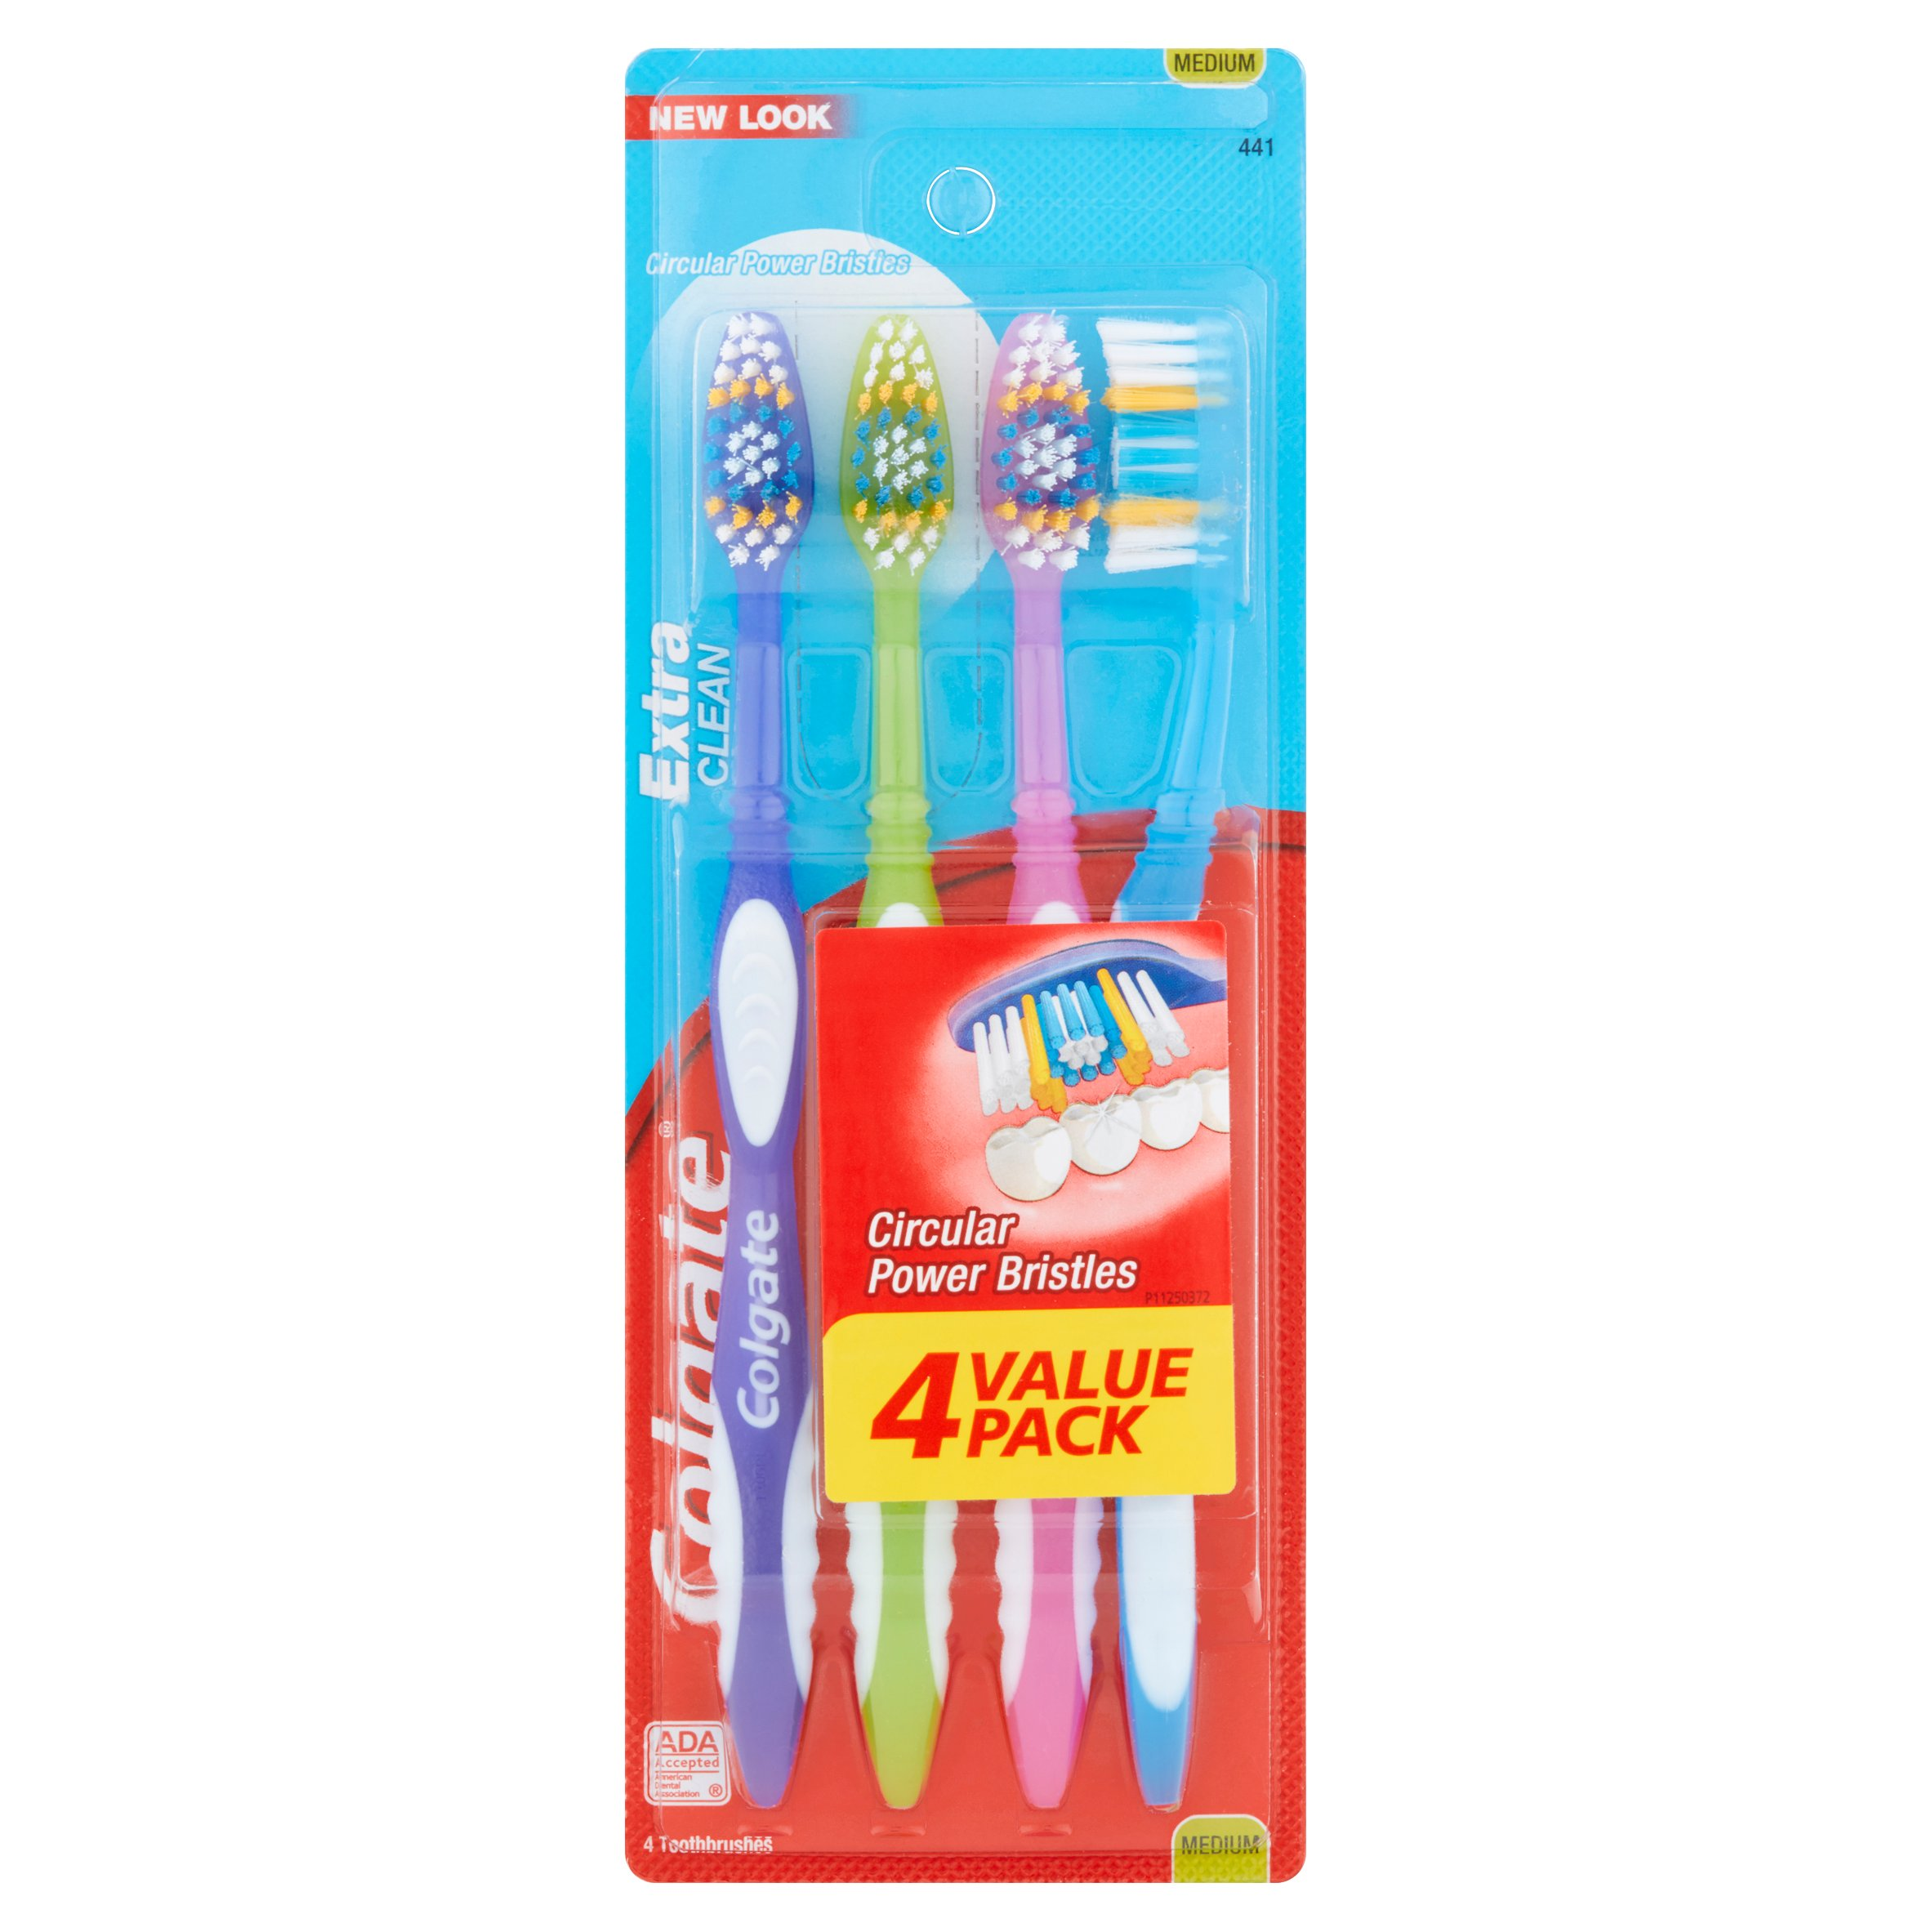 Colgate Extra Clean Toothbrush Value Pack, Medium, 4 Count